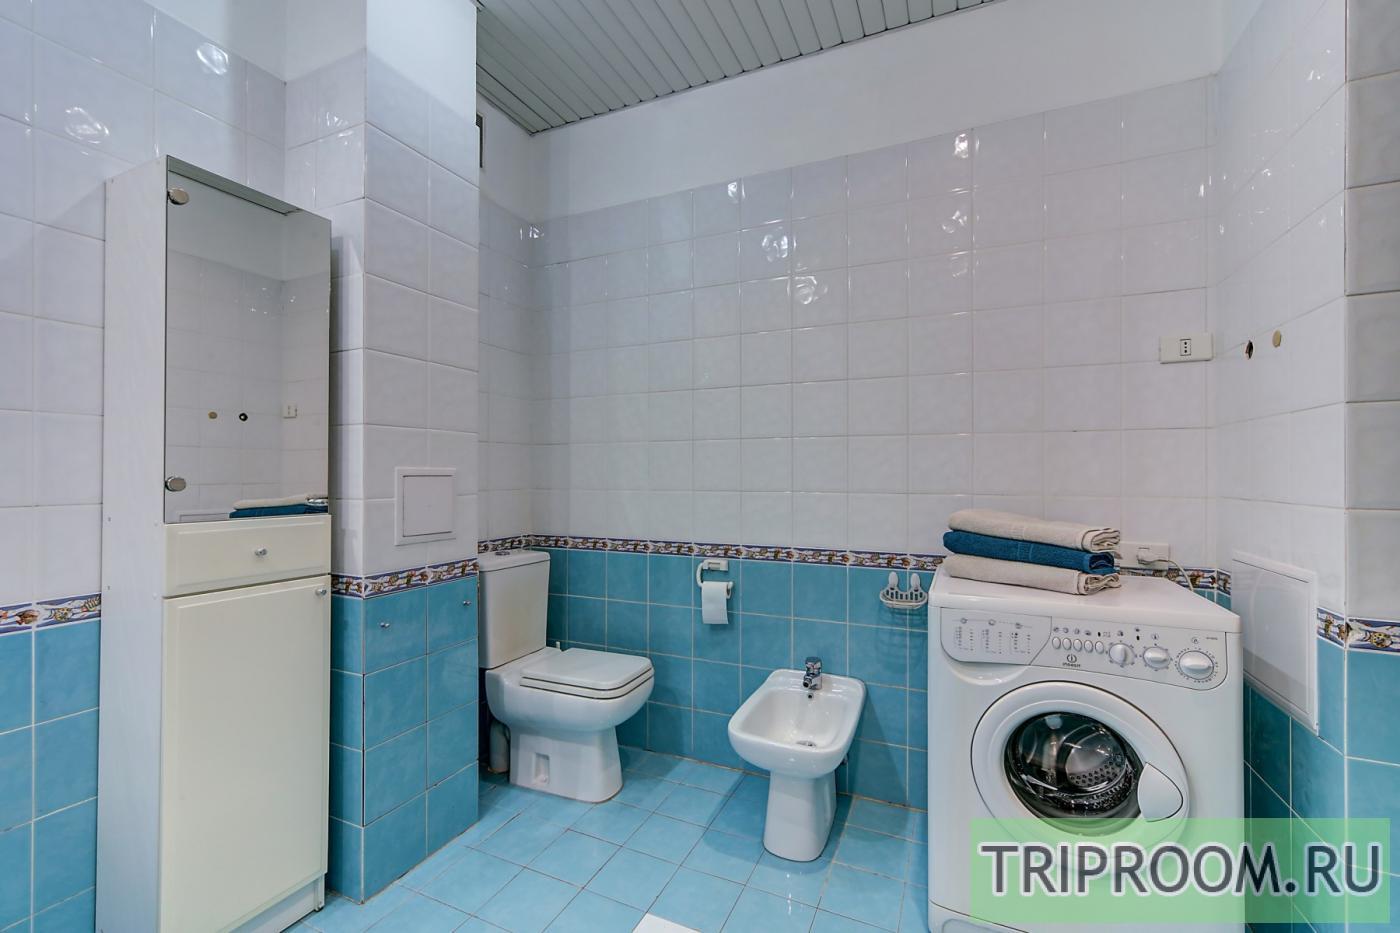 2-комнатная квартира посуточно (вариант № 20143), ул. Невский проспект, фото № 12